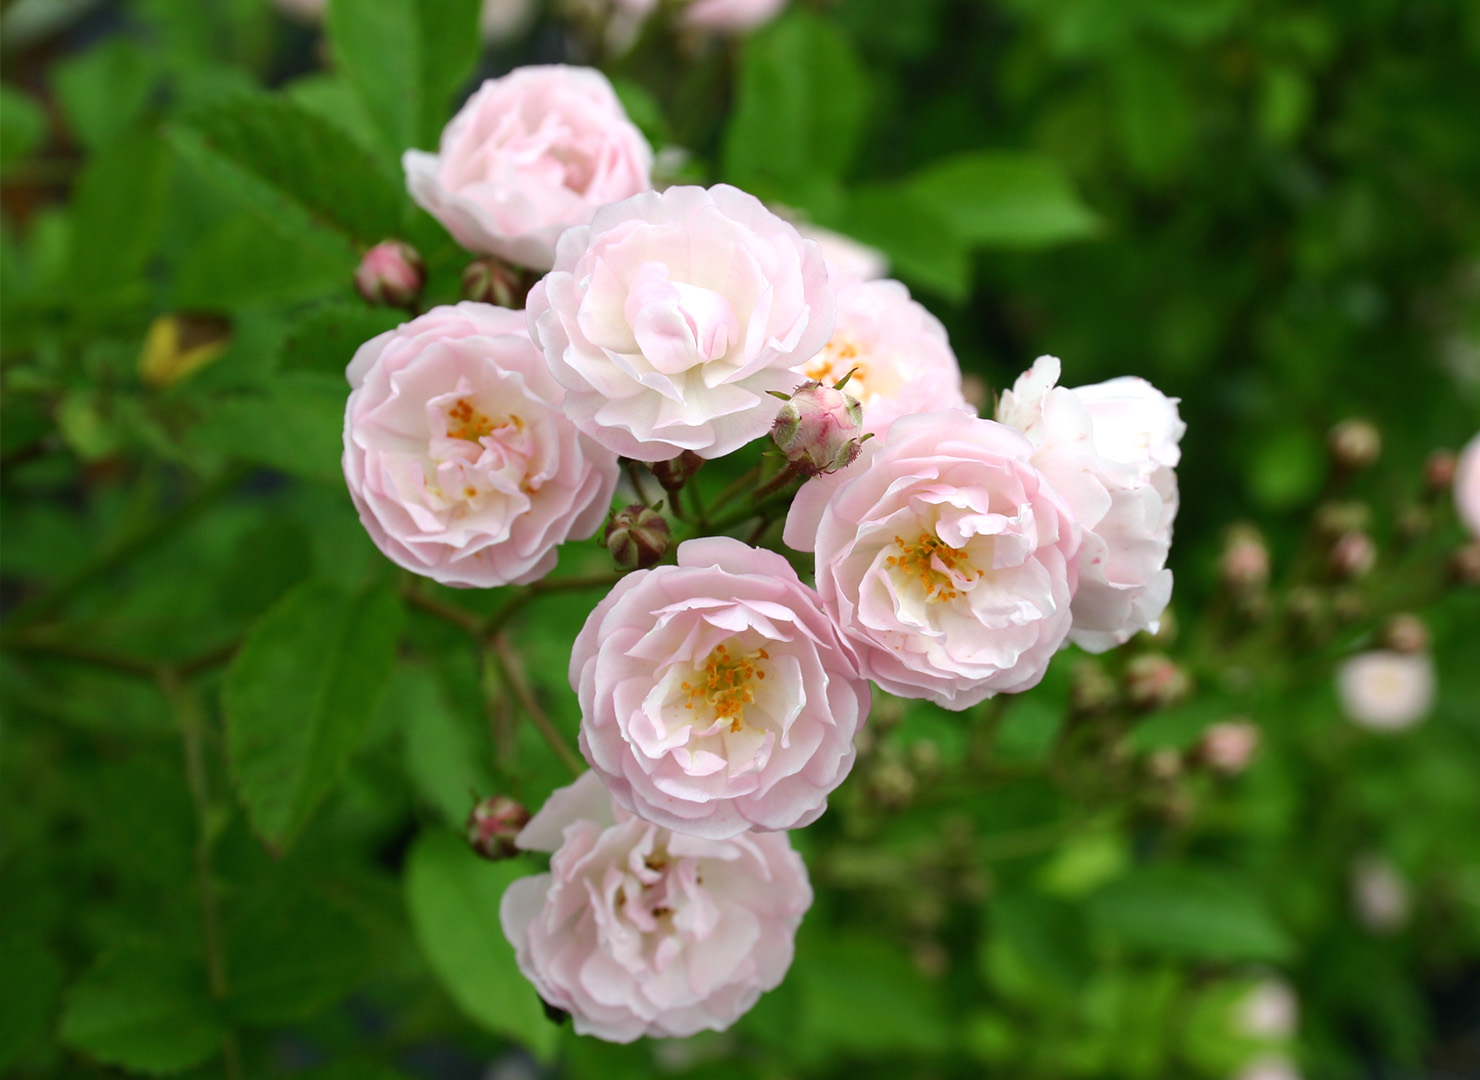 薔薇物語 - Bara monogatari